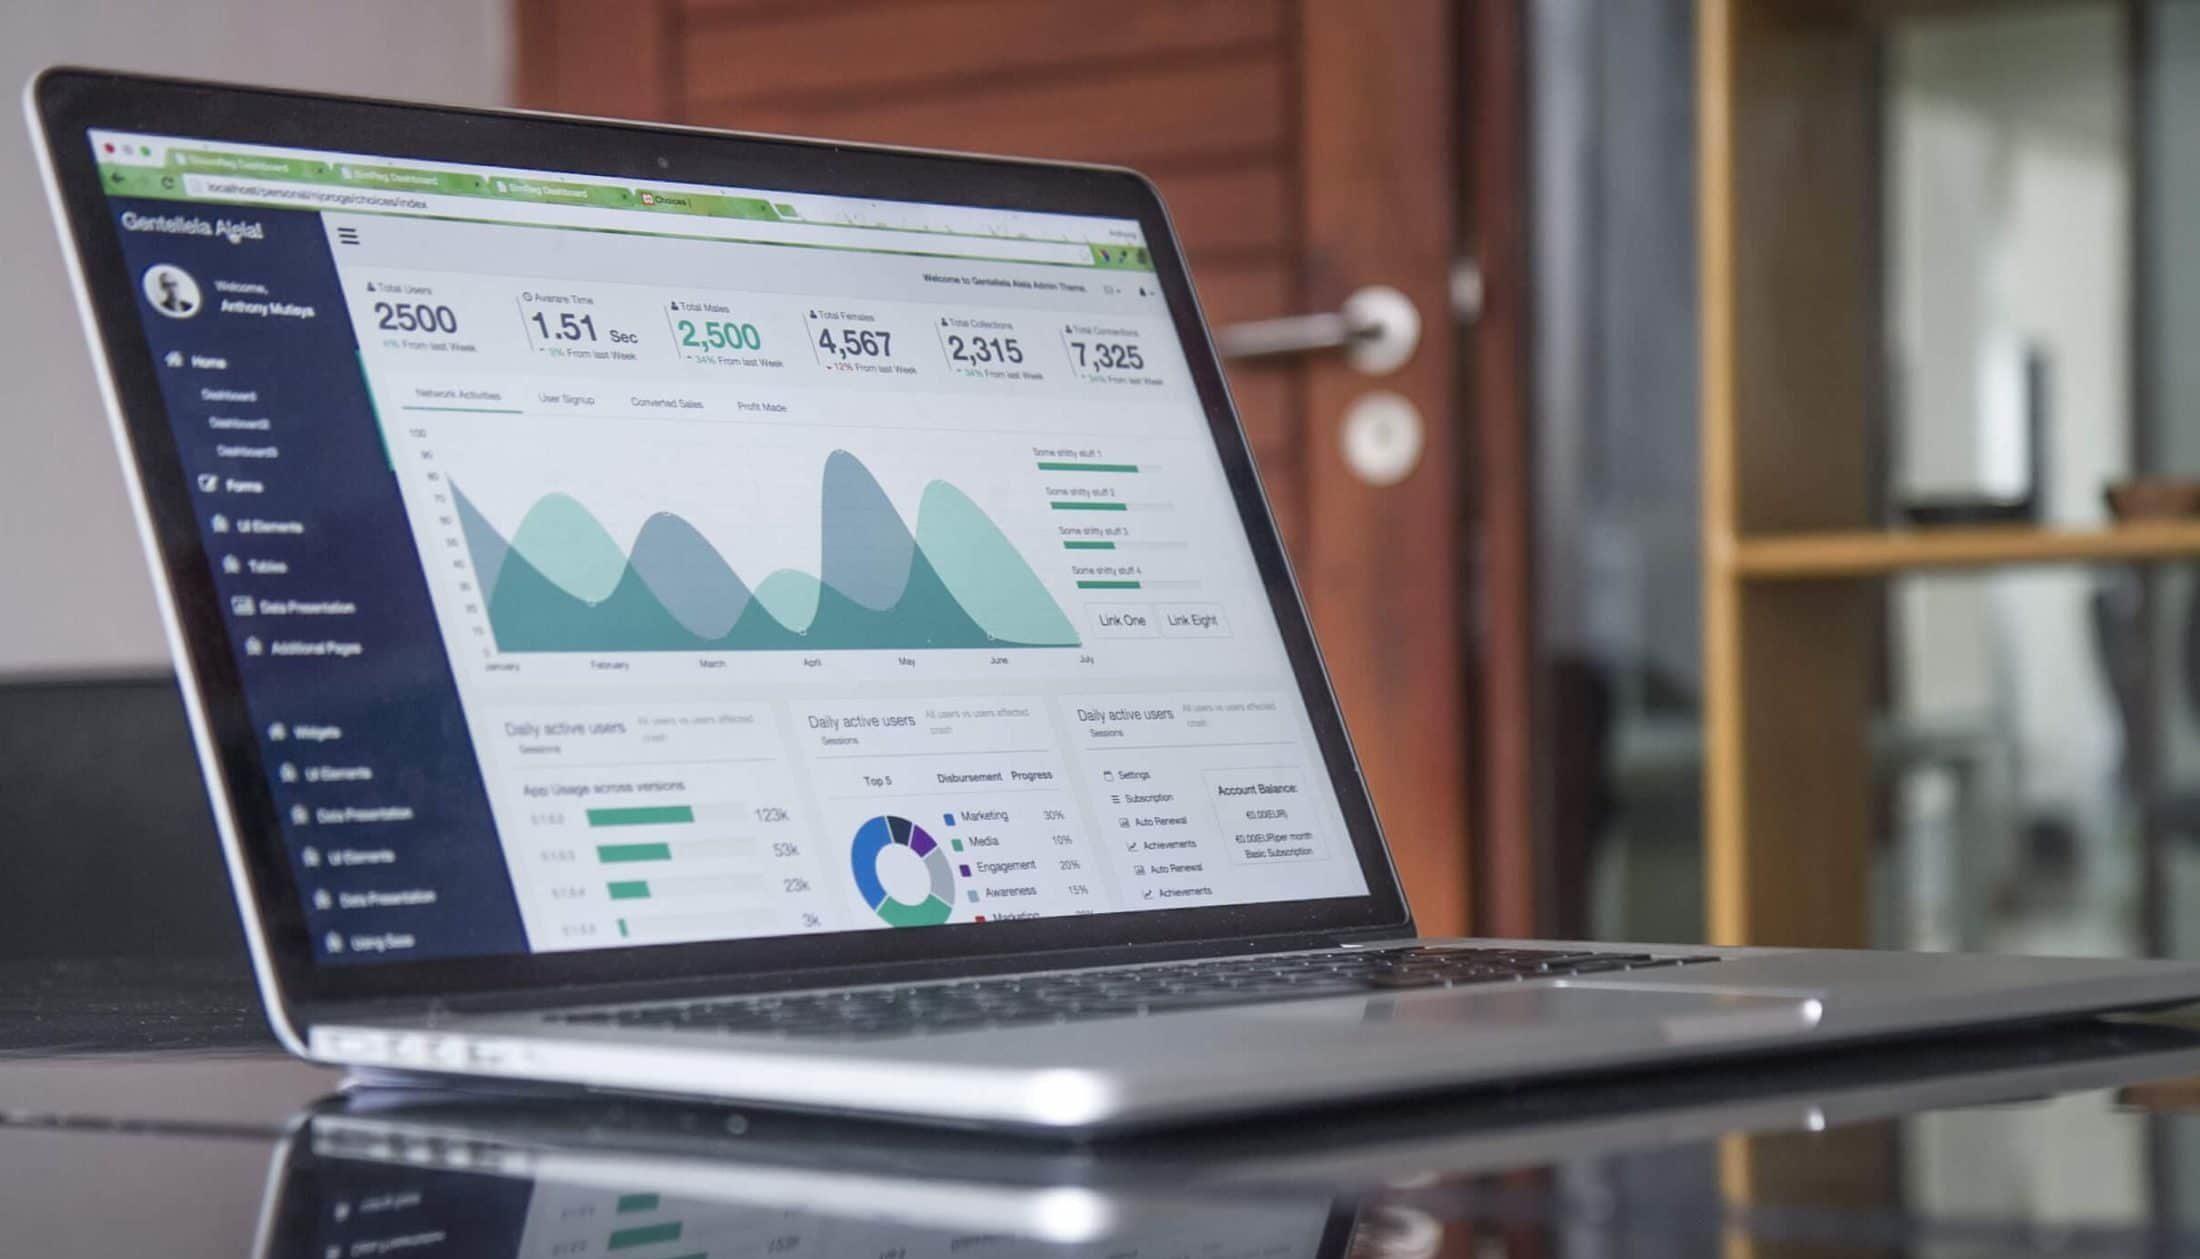 computer screen with metrics